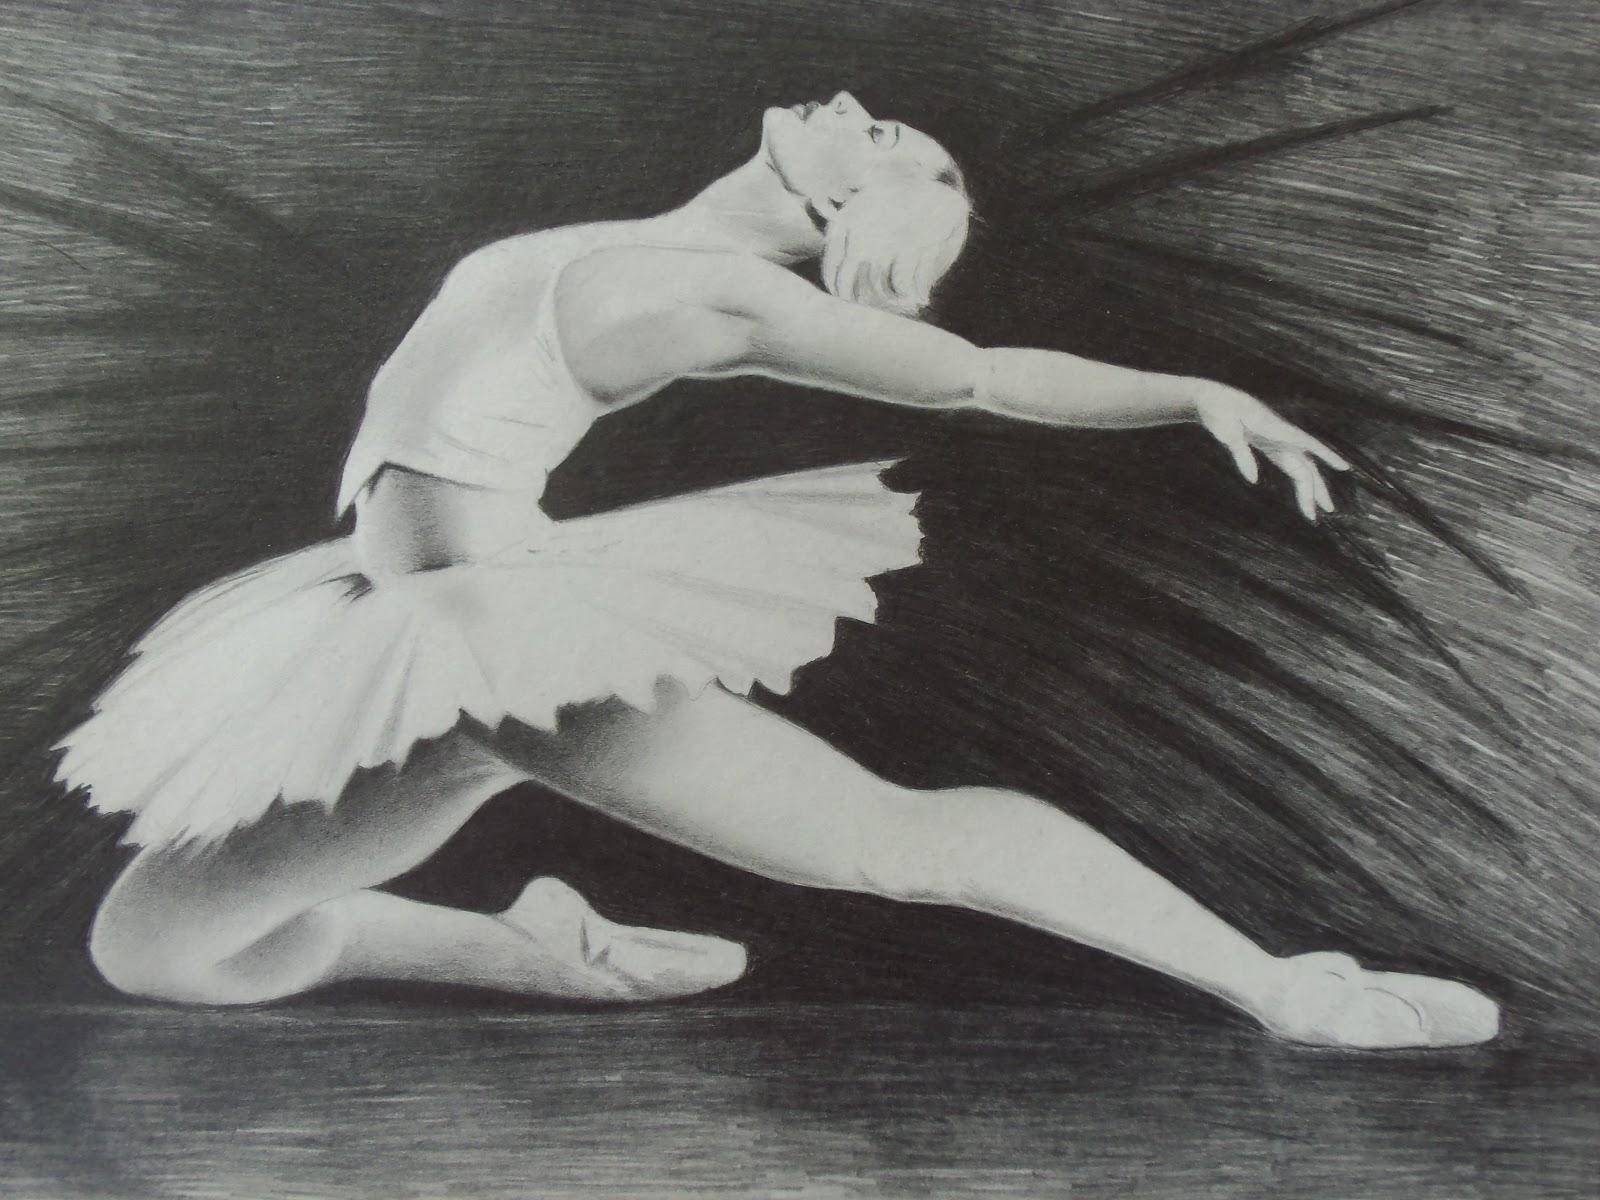 Pintura Y Dibujo: Agosto 2012